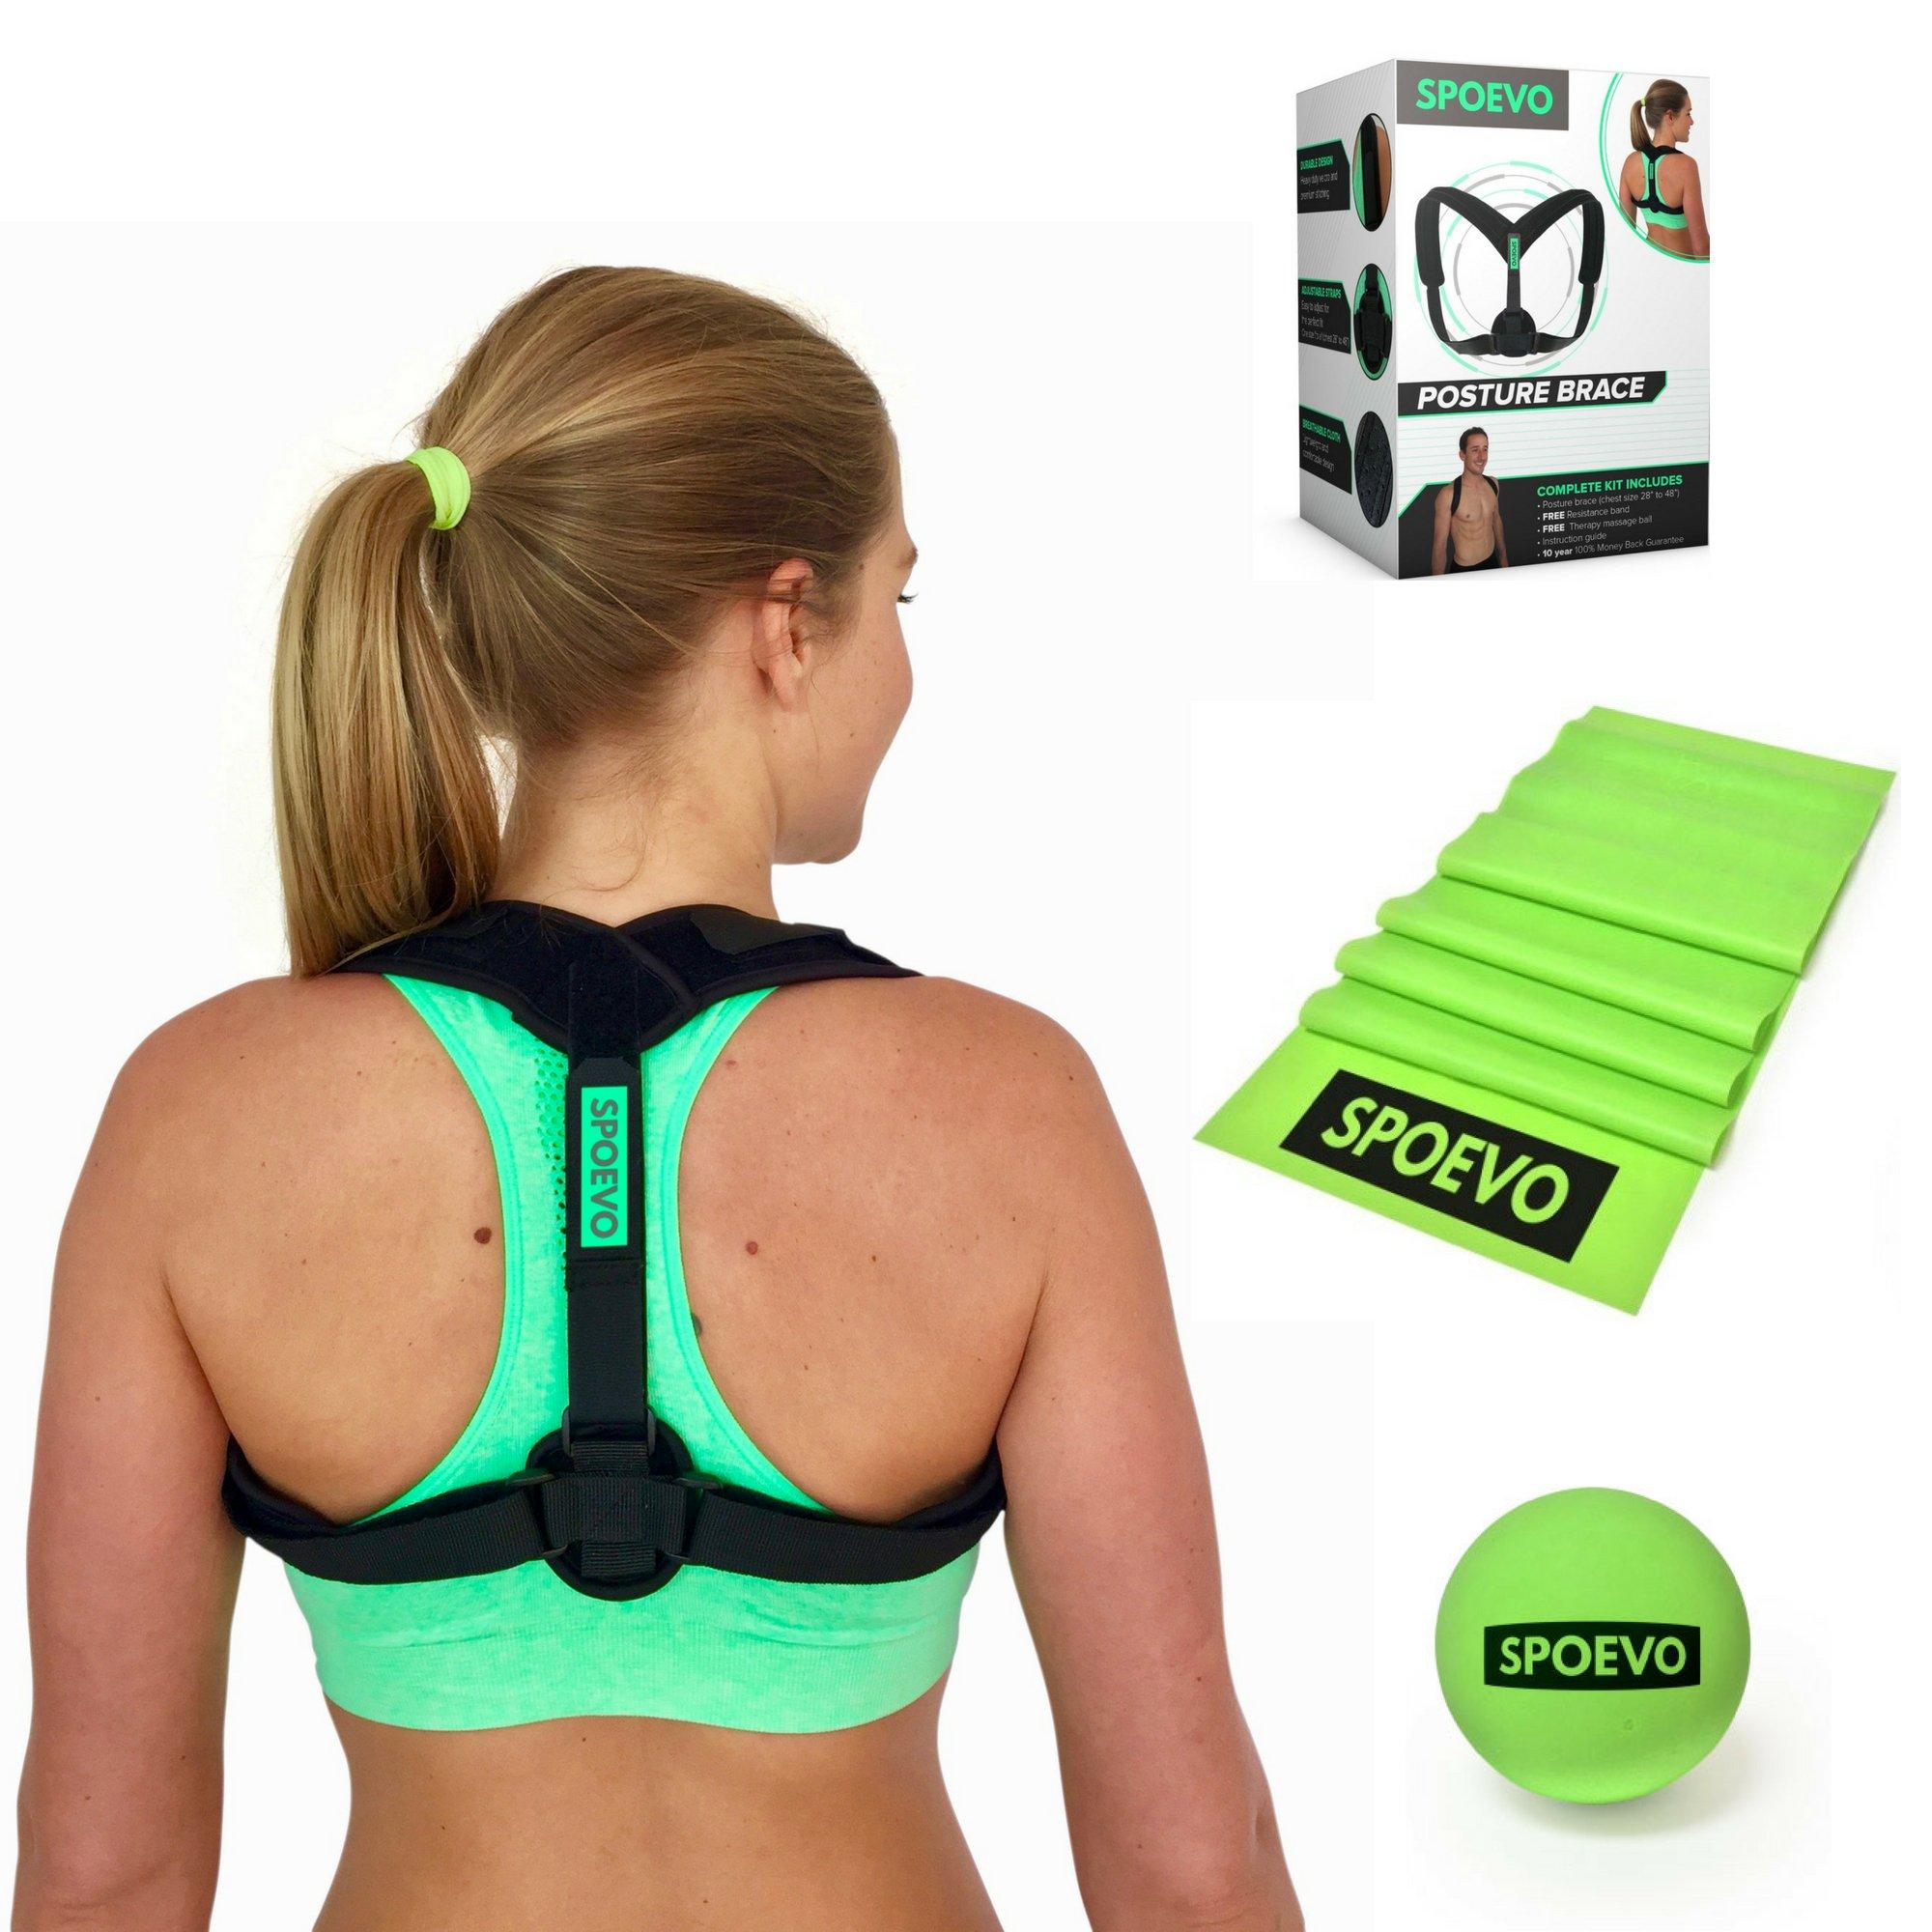 SPOEVO Back Posture Corrector For Women & Men - Includes Back Straightener Posture Brace, FREE Resistance Band & Massage Ball for Natural Spine Alignment & Posture Support